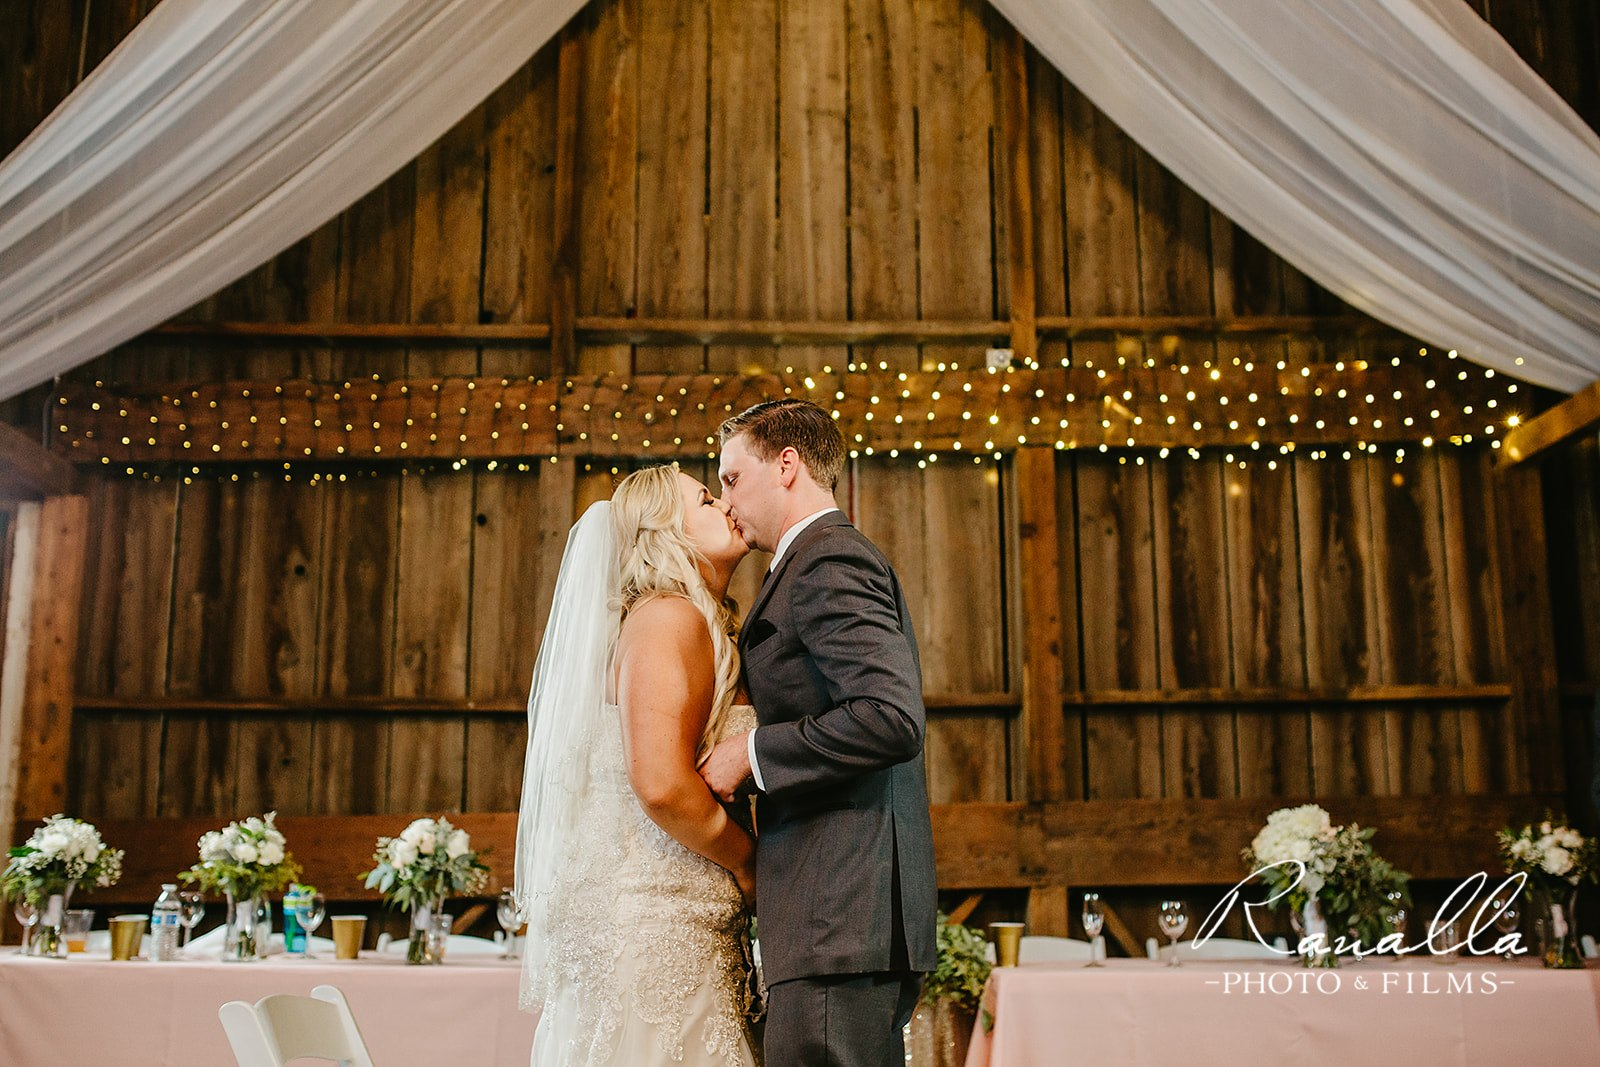 Taylor and Taylor Wedding-Ranalla Photo _ Films-1158.jpg